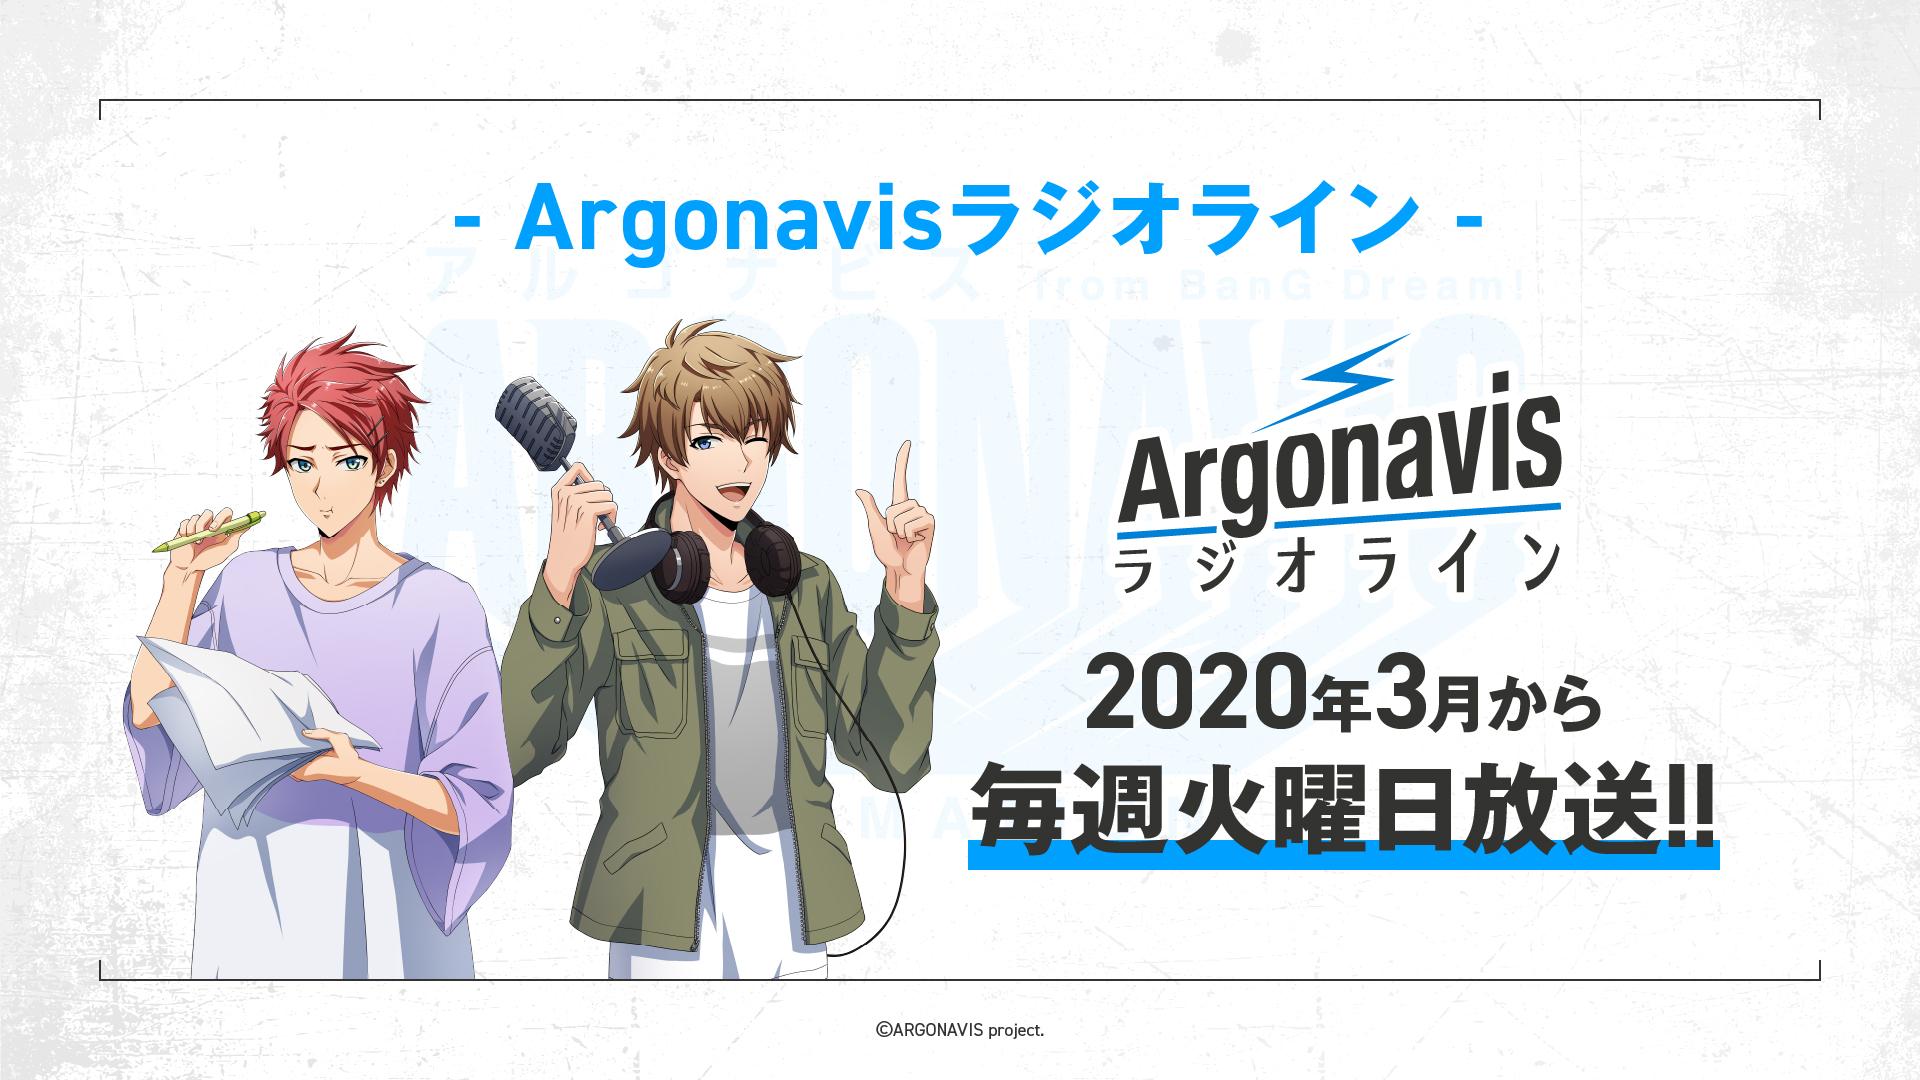 「Argonavis ラジオライン」が毎週放送に!